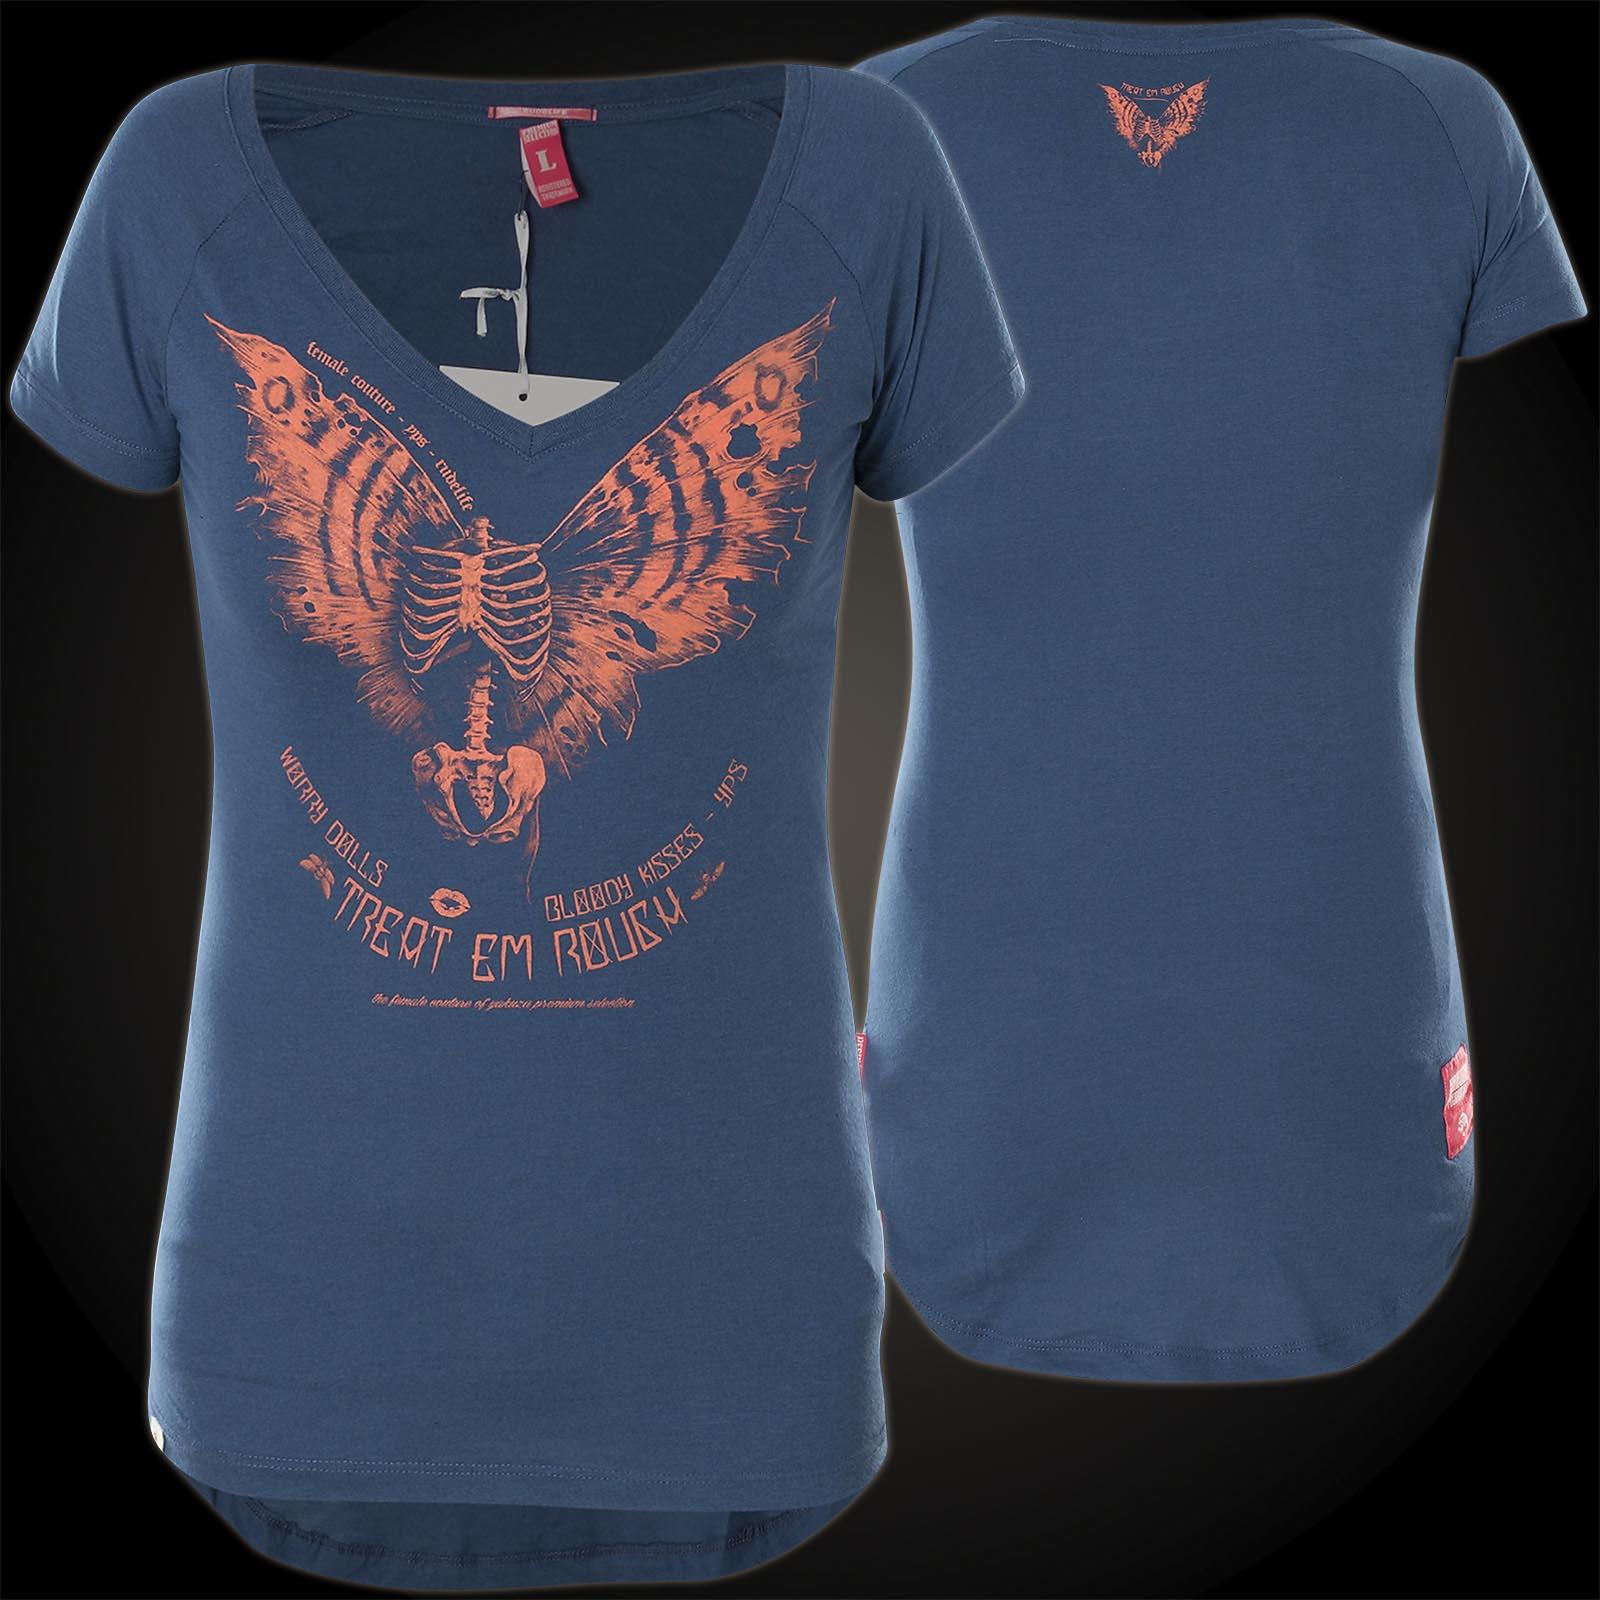 b75539ed2ab3 Yakuza Premium T-Shirt GS-2336 in blau mit großem Printdesign